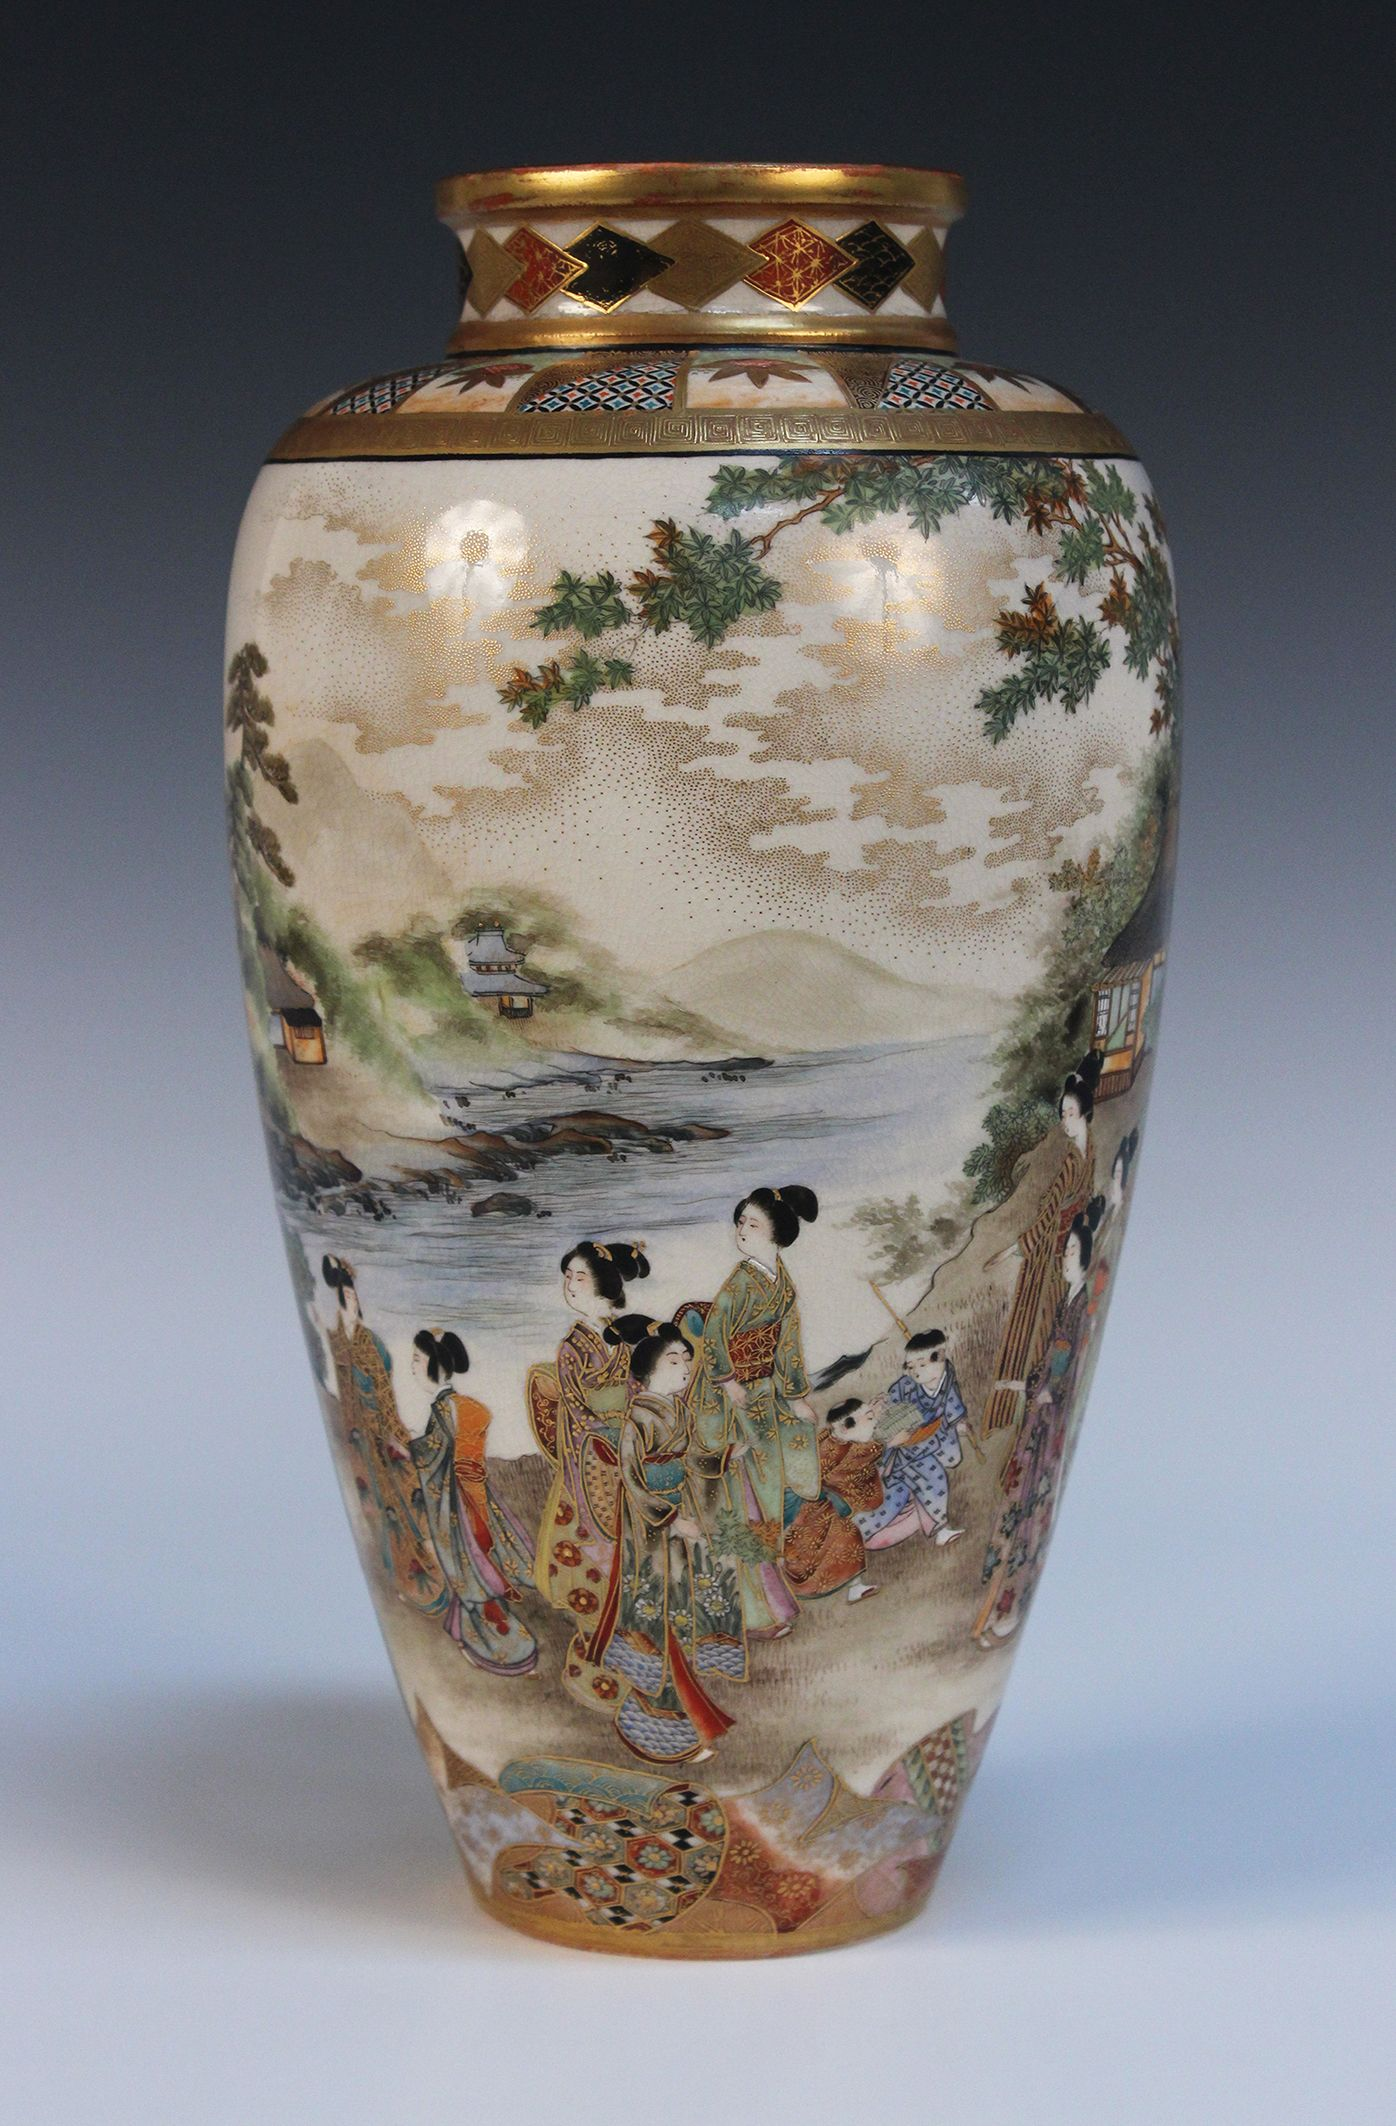 A Japanese Satsuma Earthenware Vase By Ryozan For The Yasuda Company Japanese China Amp Ceramics